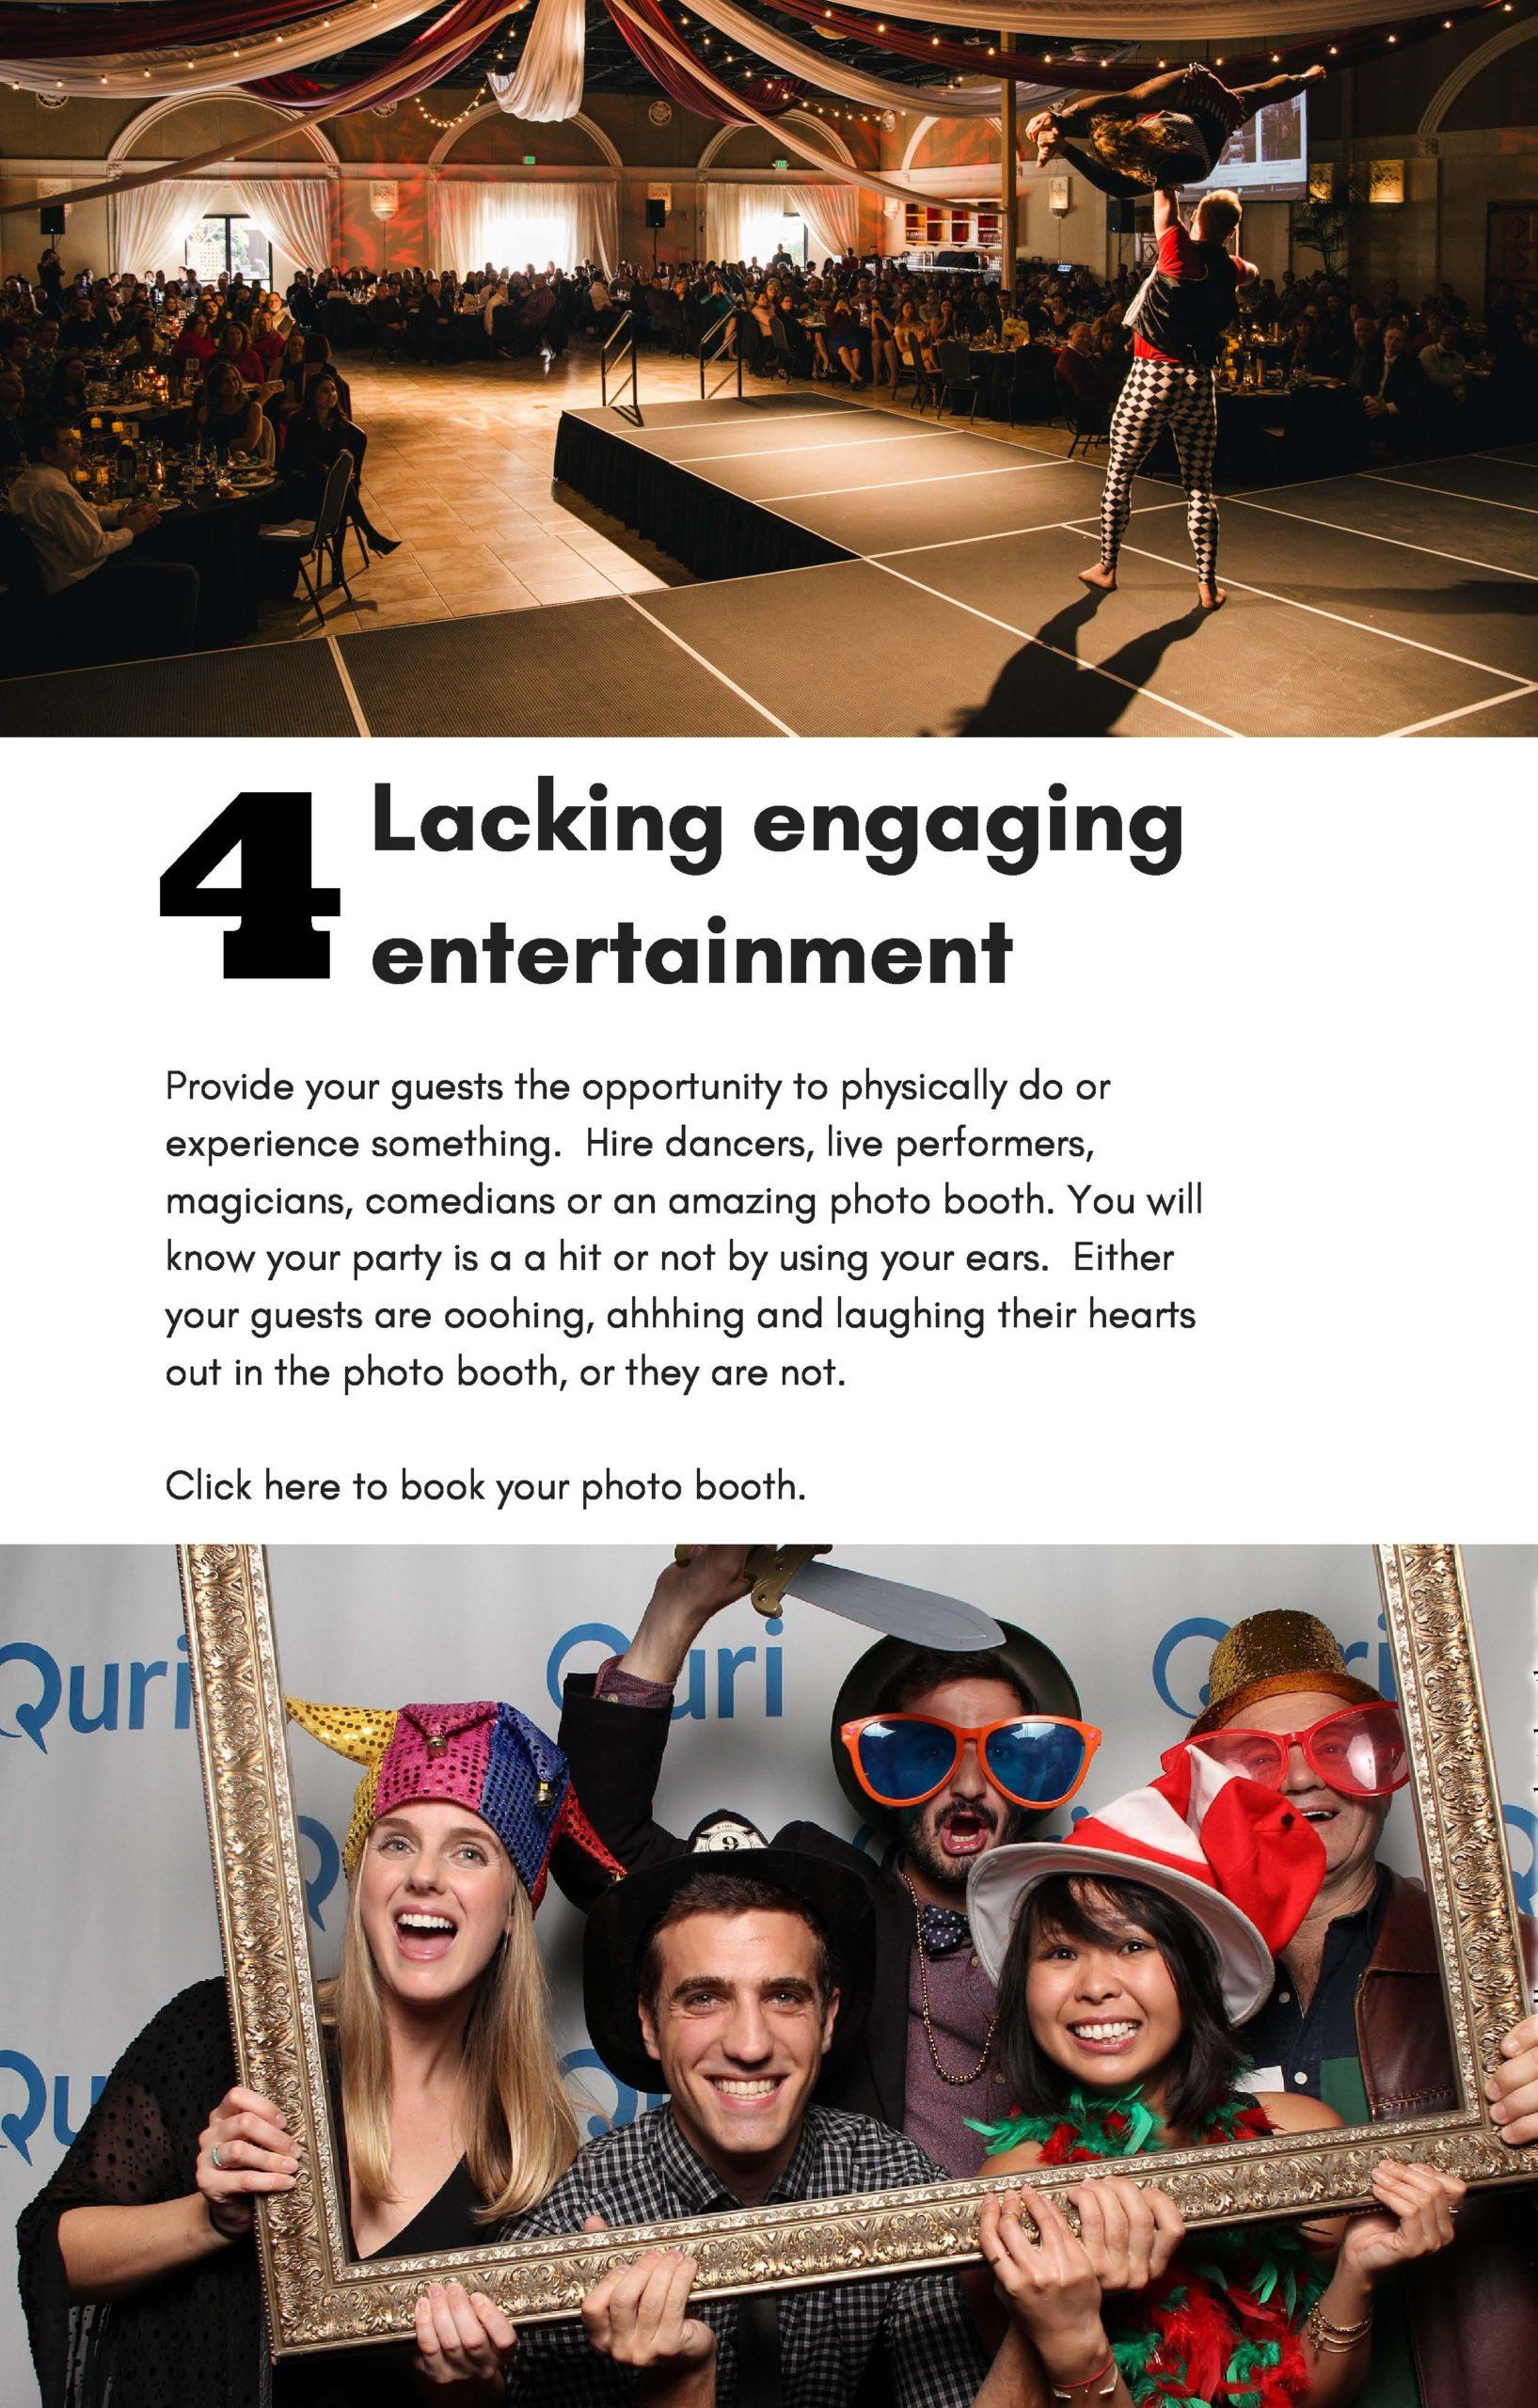 Lacking engaging entertainment